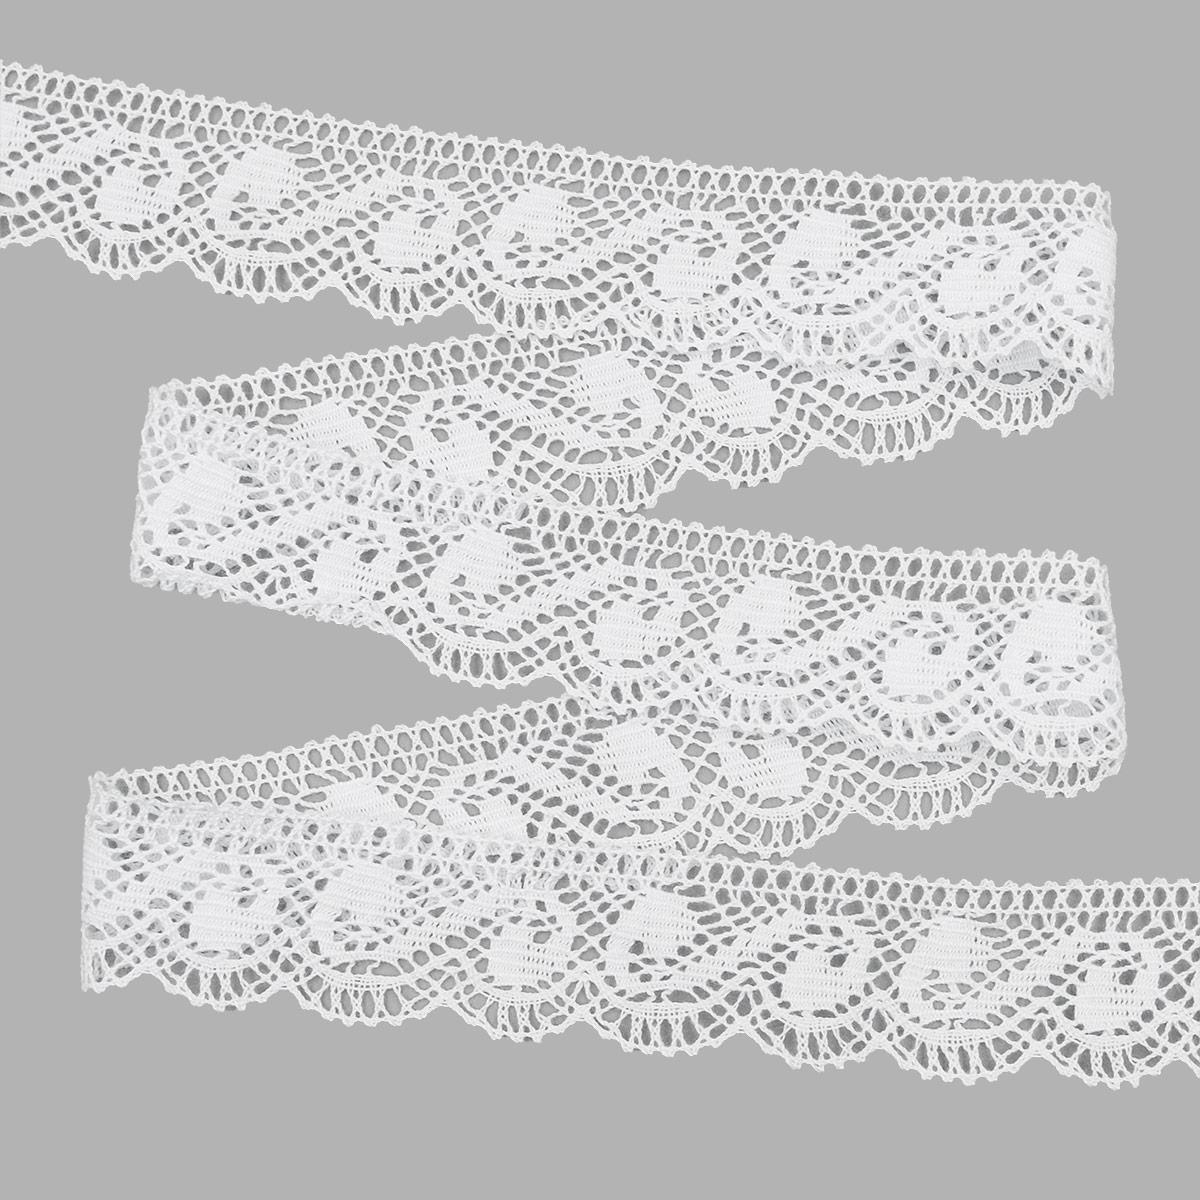 50-1443-16/01 Тесьма вяз ажур х/б 35мм*25м бел одностор. ГР